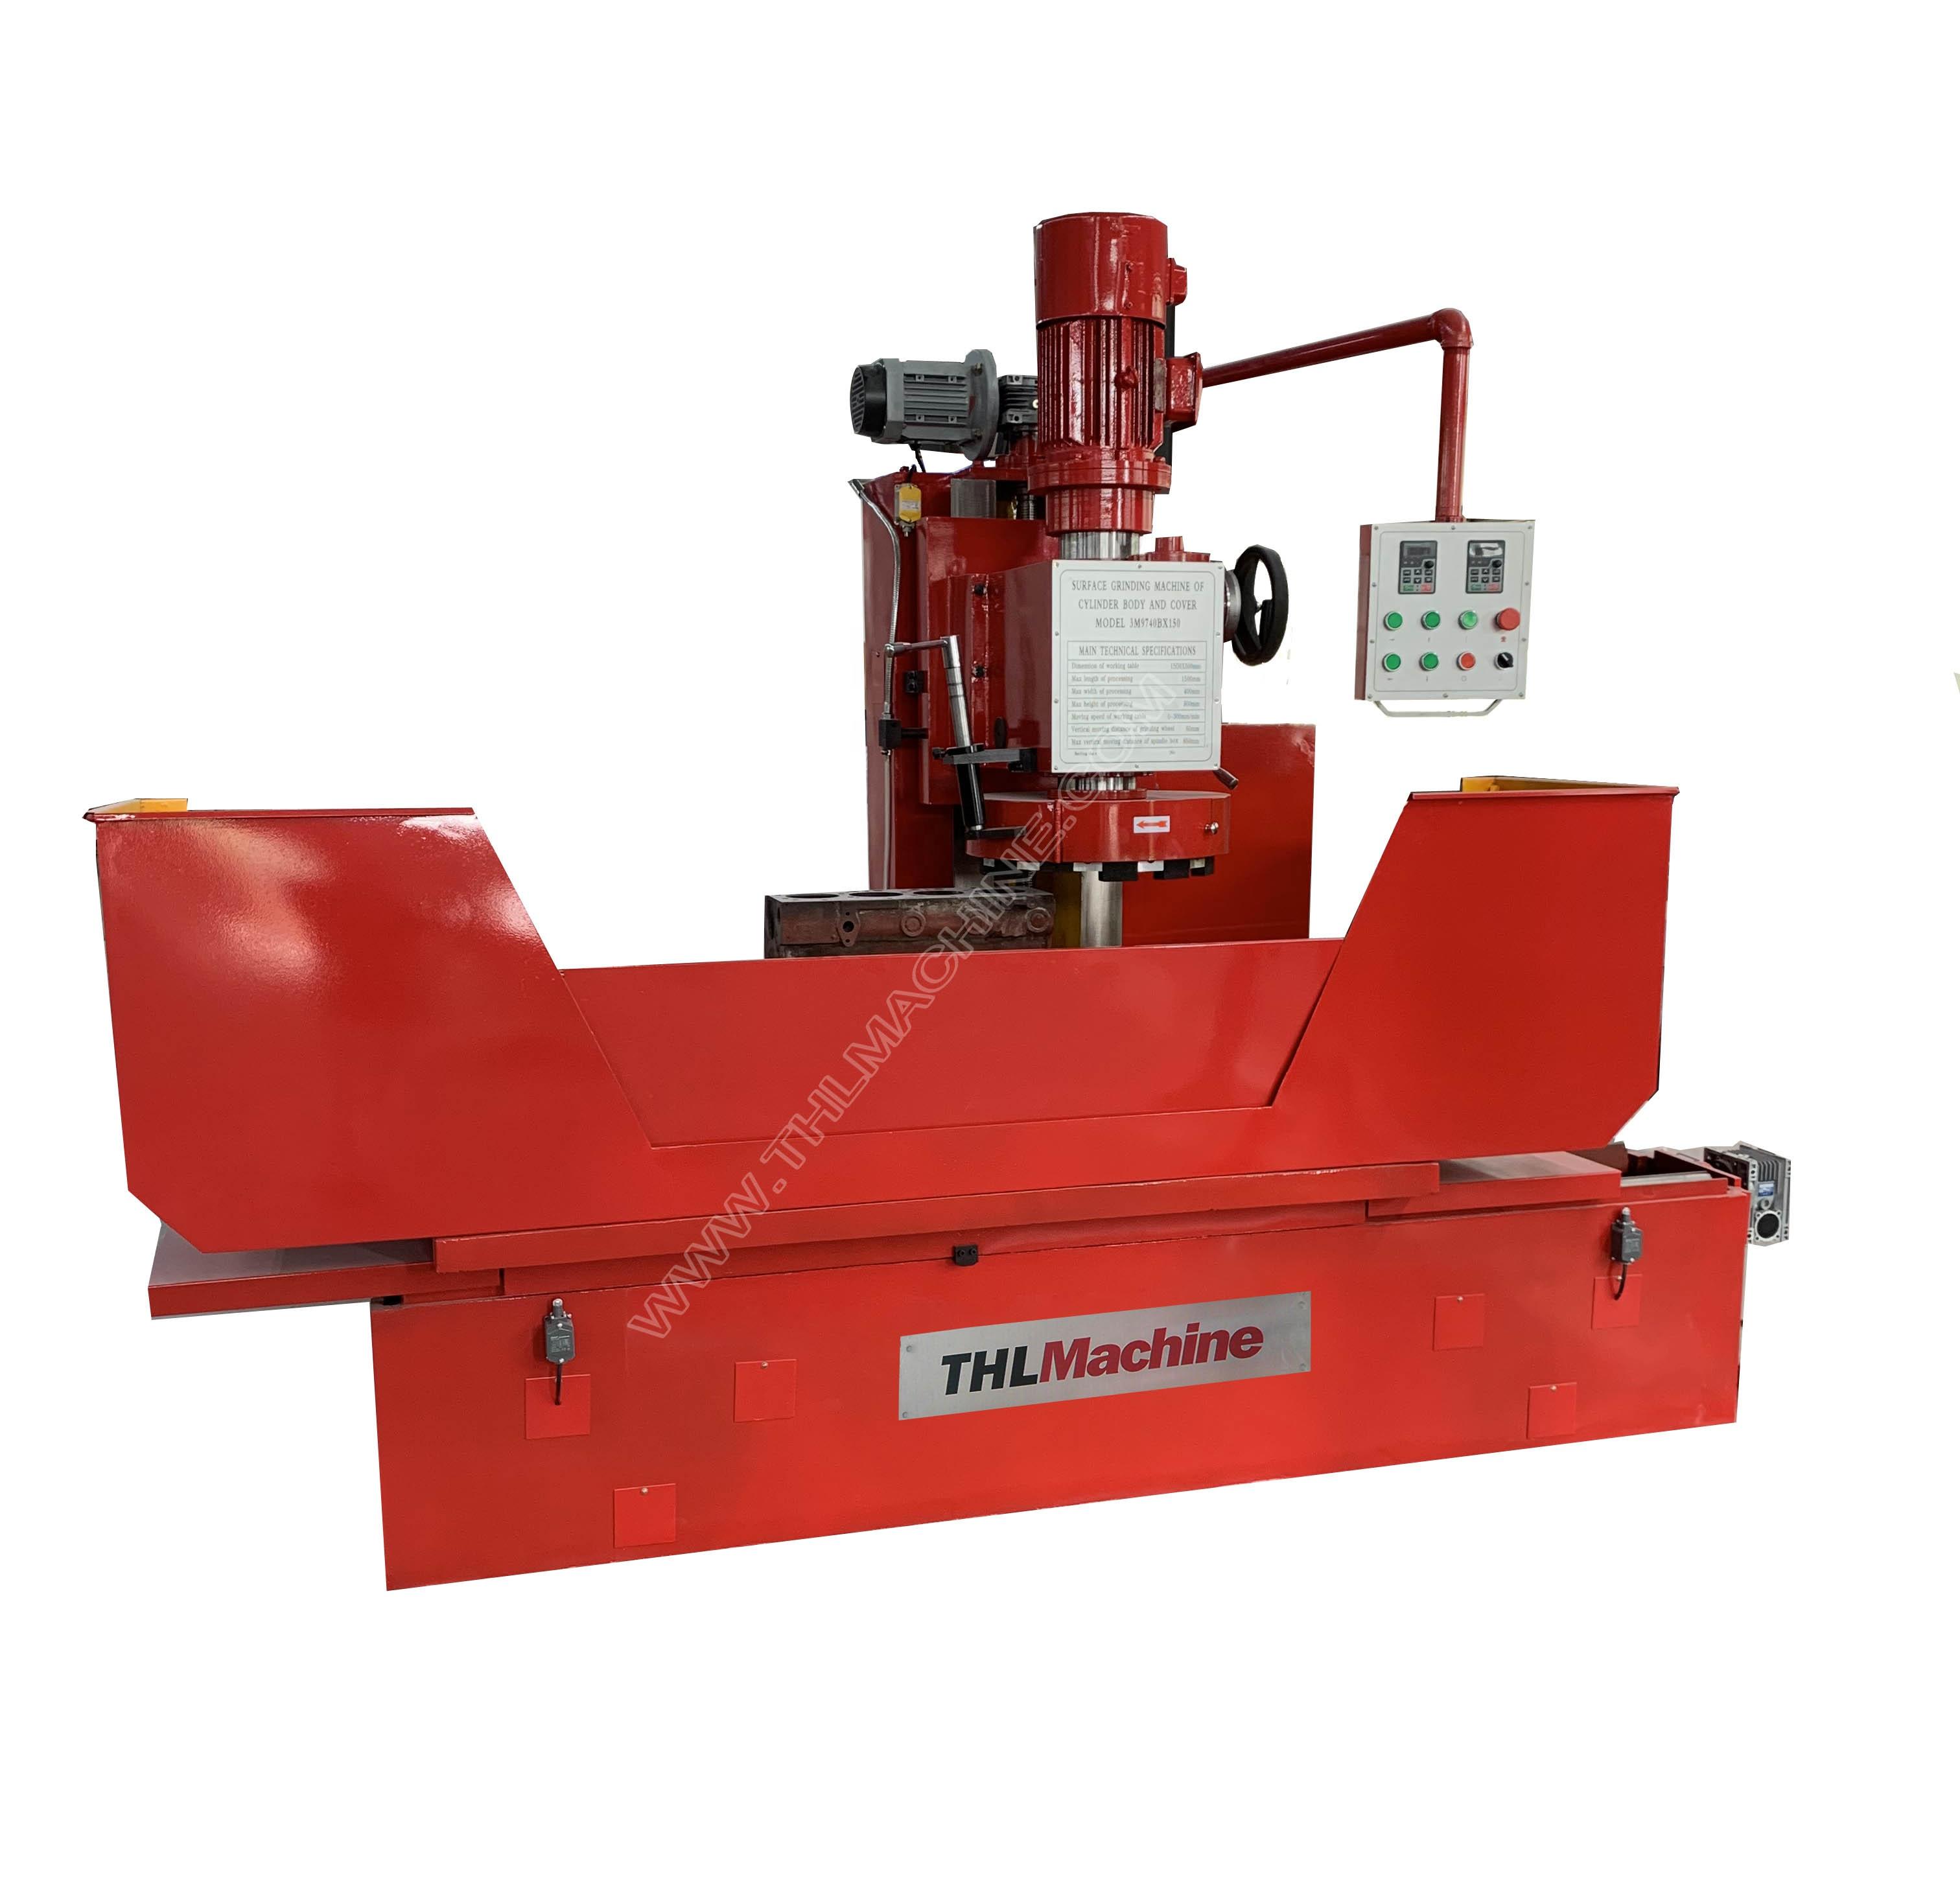 Cylinder Head And Block Resurfacing Machine 3m9735b/3m9740b - Buy Head And  Block Resurfacing Machine,Head And Block Resurfacer,Head And Block Surfacer